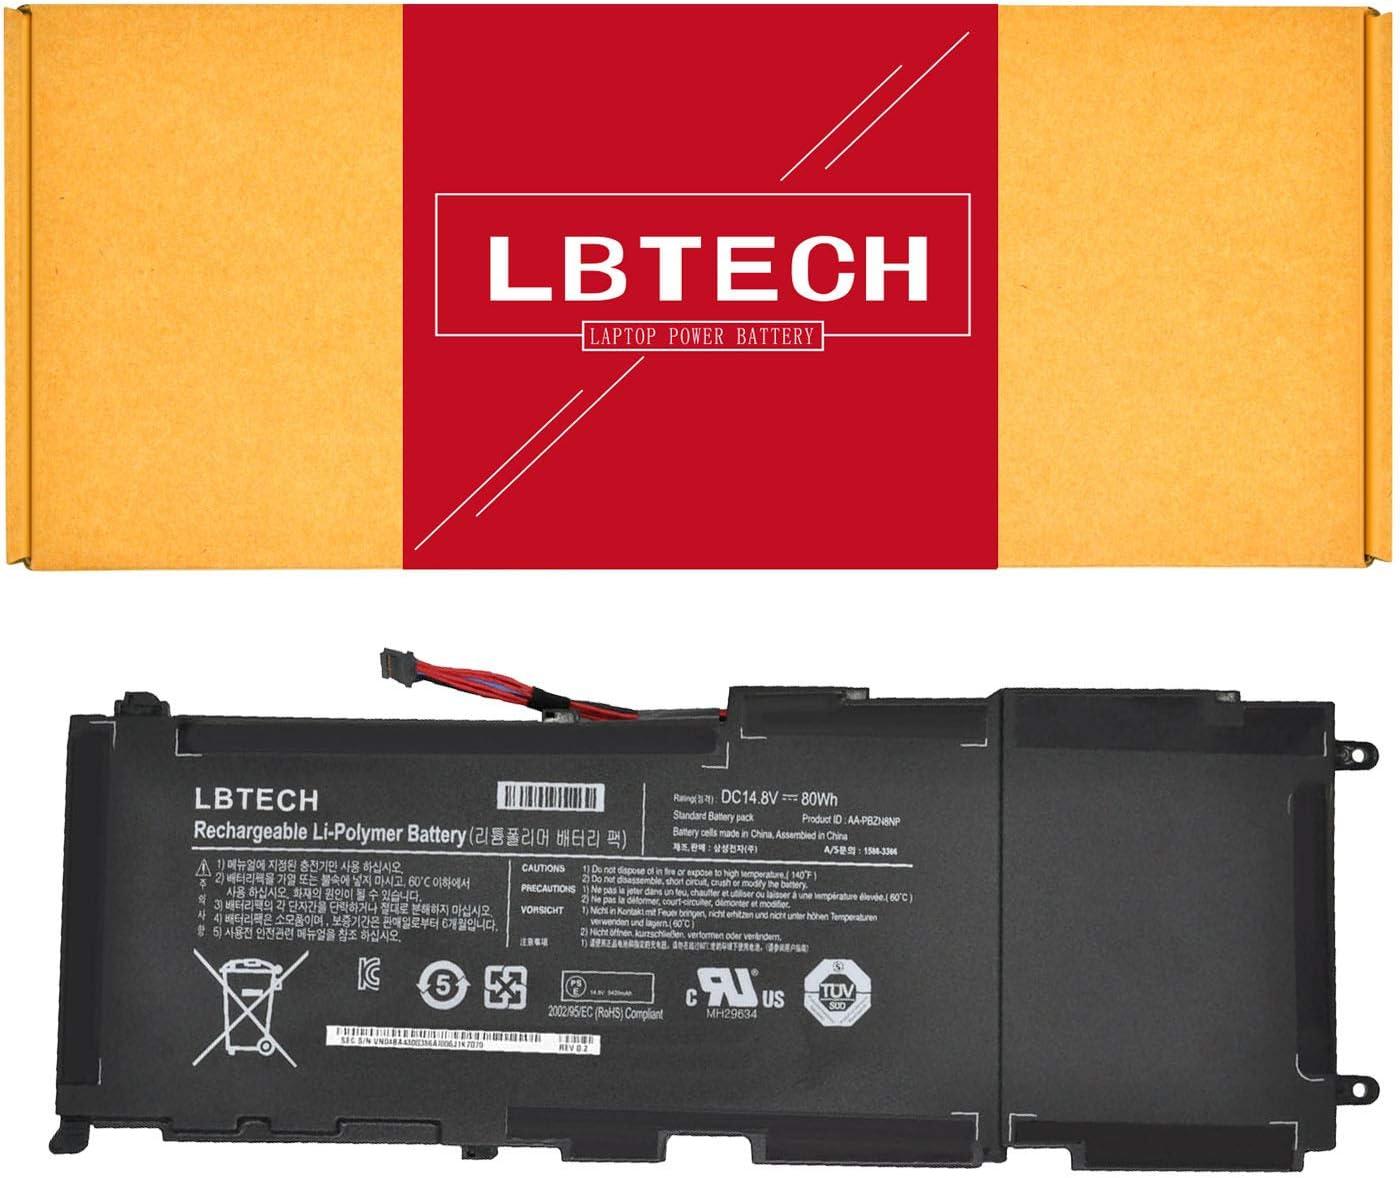 LBTECH Compatible AA-PBZN8NP Laptop Battery Replacement for Samsung 7 Np-700 Np700z7c NP700Z5A Np700z5b 700z Series 14.8V 80Wh